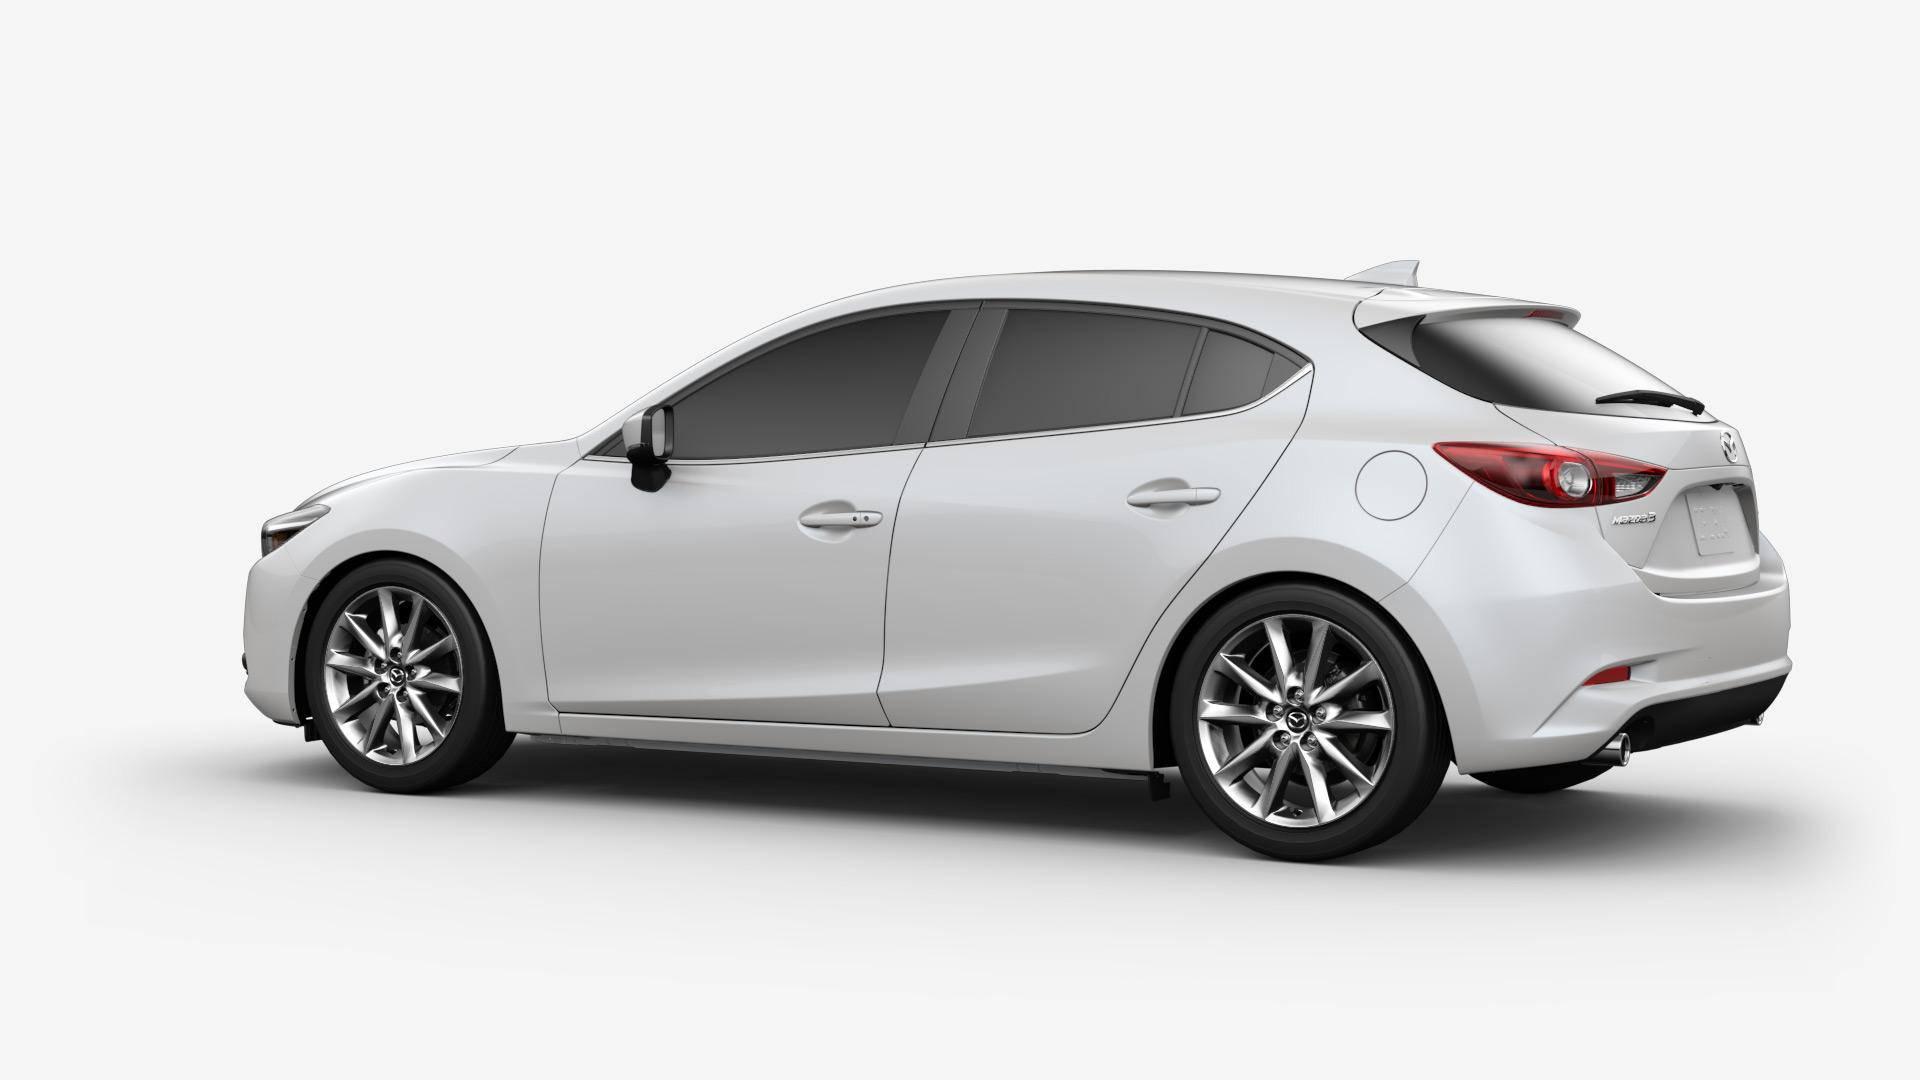 2018 mazda 3 hatchback - fuel efficient compact car | mazda usa